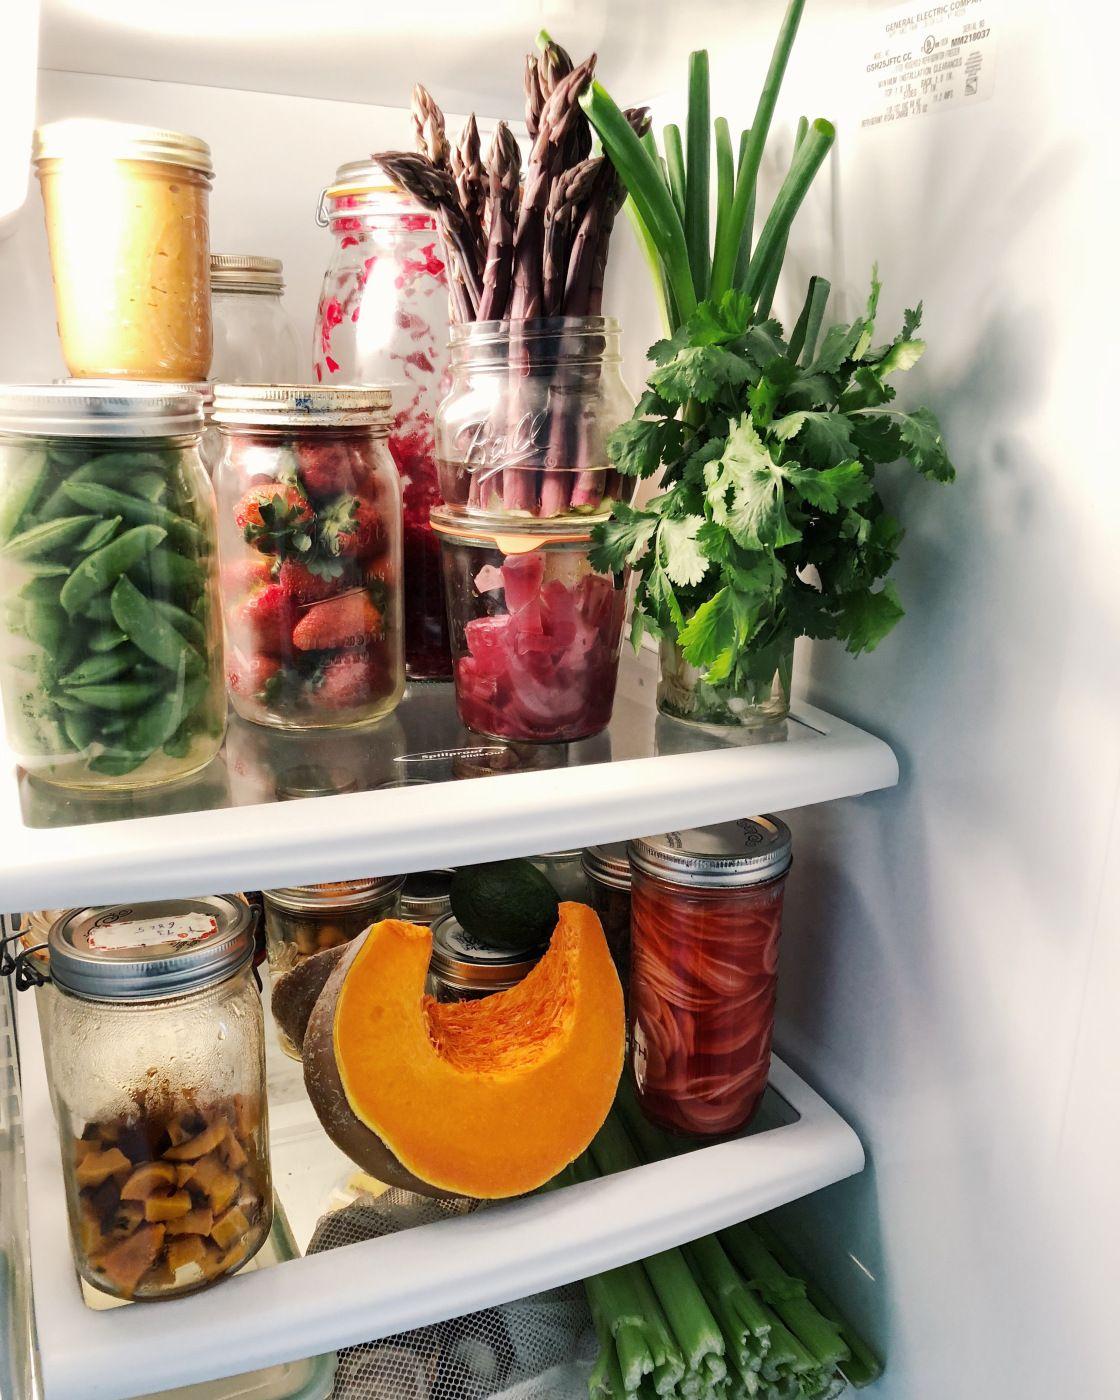 zero waste fridge zero waste kitchen zero waste mama eat on kitchen organization zero waste id=25297